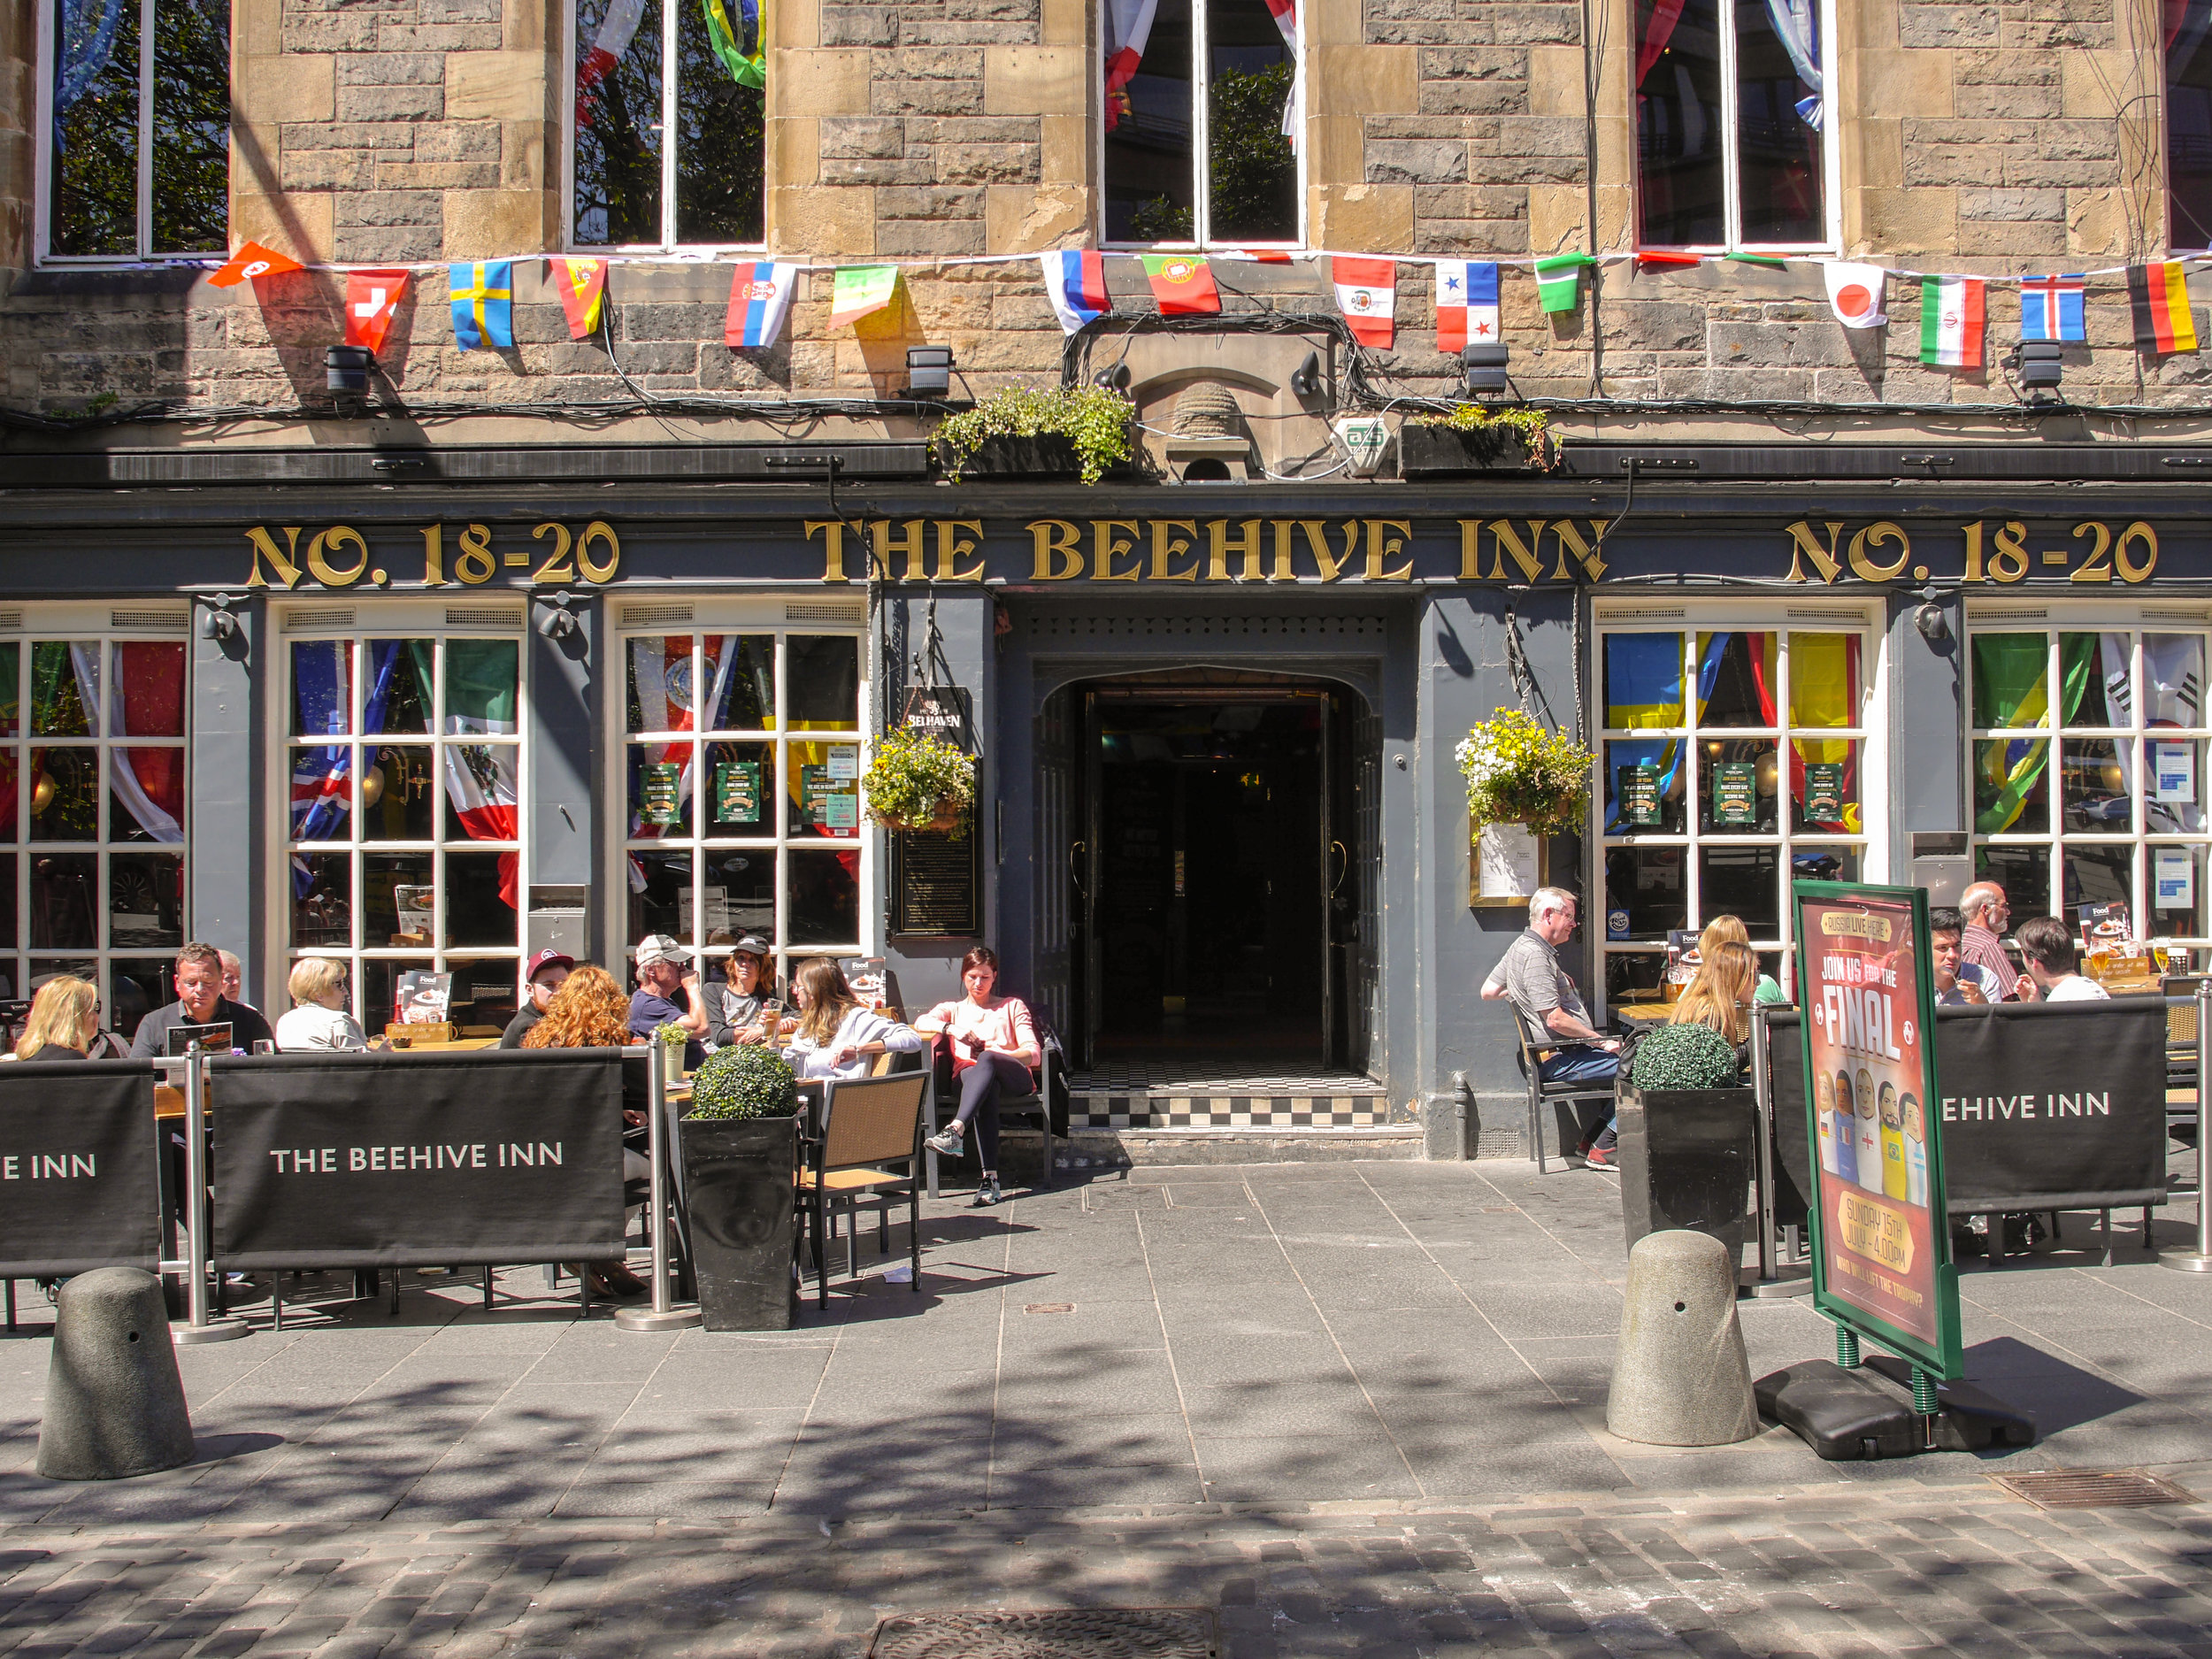 The Beehive Inn in Edinburgh, Scotland, UK